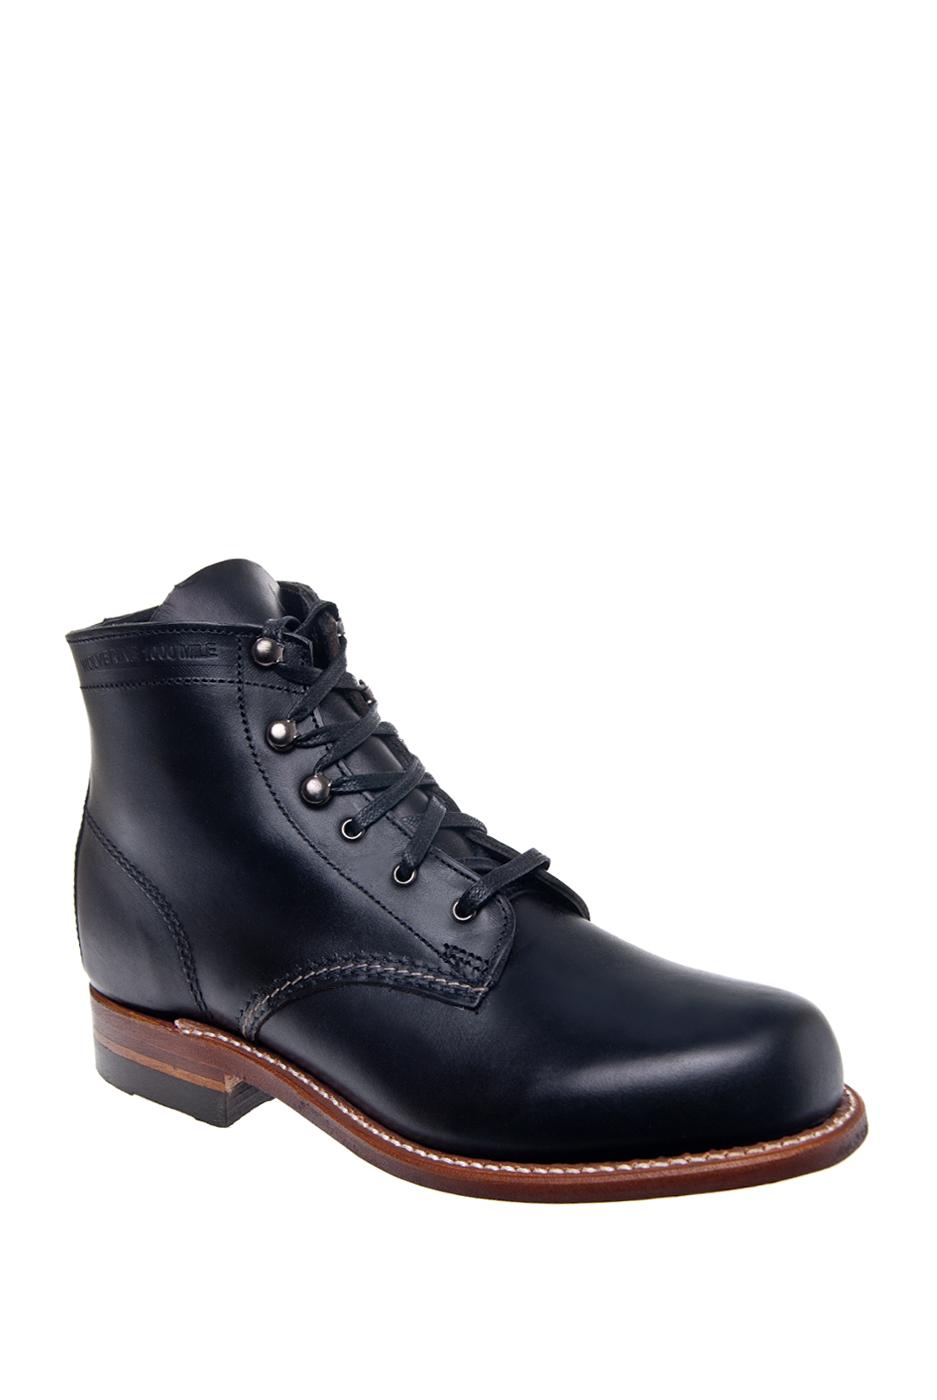 Wolverine 1000 Mile Low Heel Boots - Black